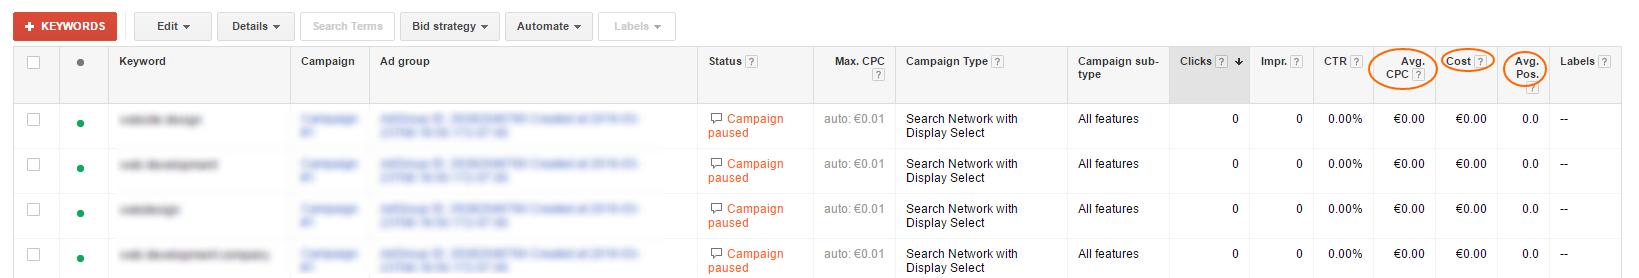 Google Adword dashboard